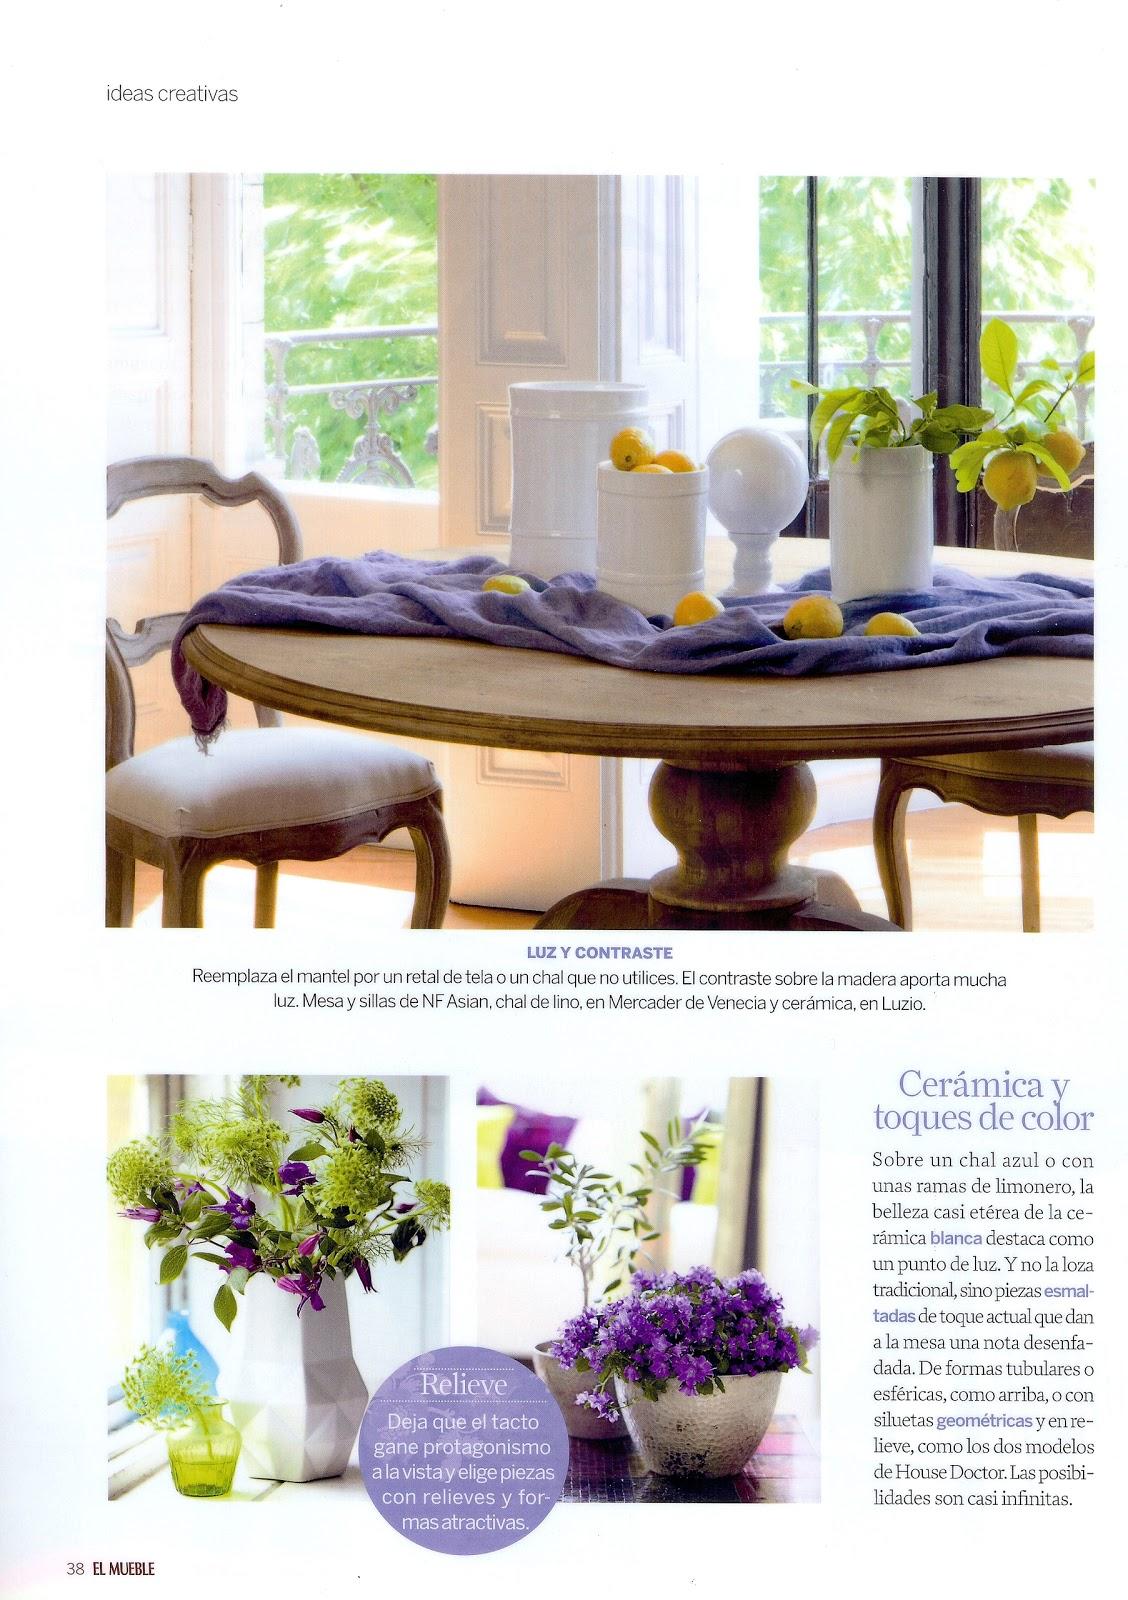 La glicina decorar mesa comedor iv - Decorar mesa comedor ...